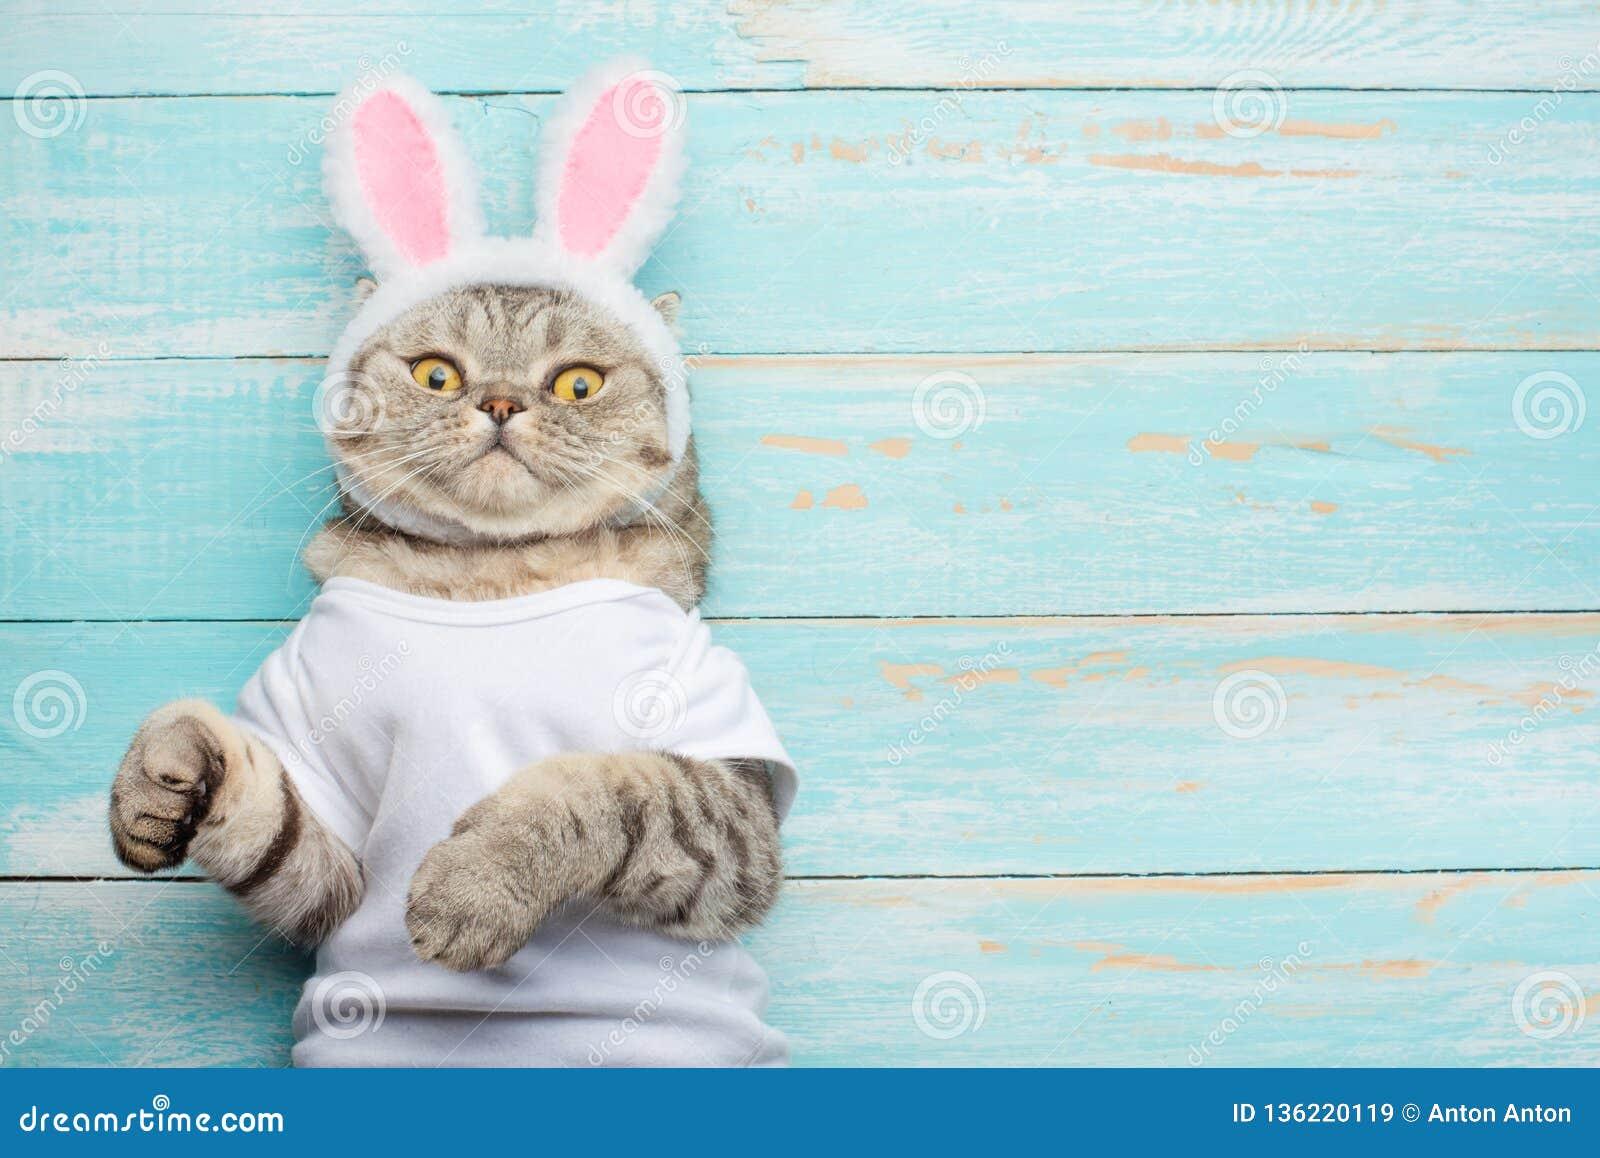 Easter Cat With Rabbit Ears Banner Easter Screensaver For Design Stock Image Image Of Background Eastereggs 136220119